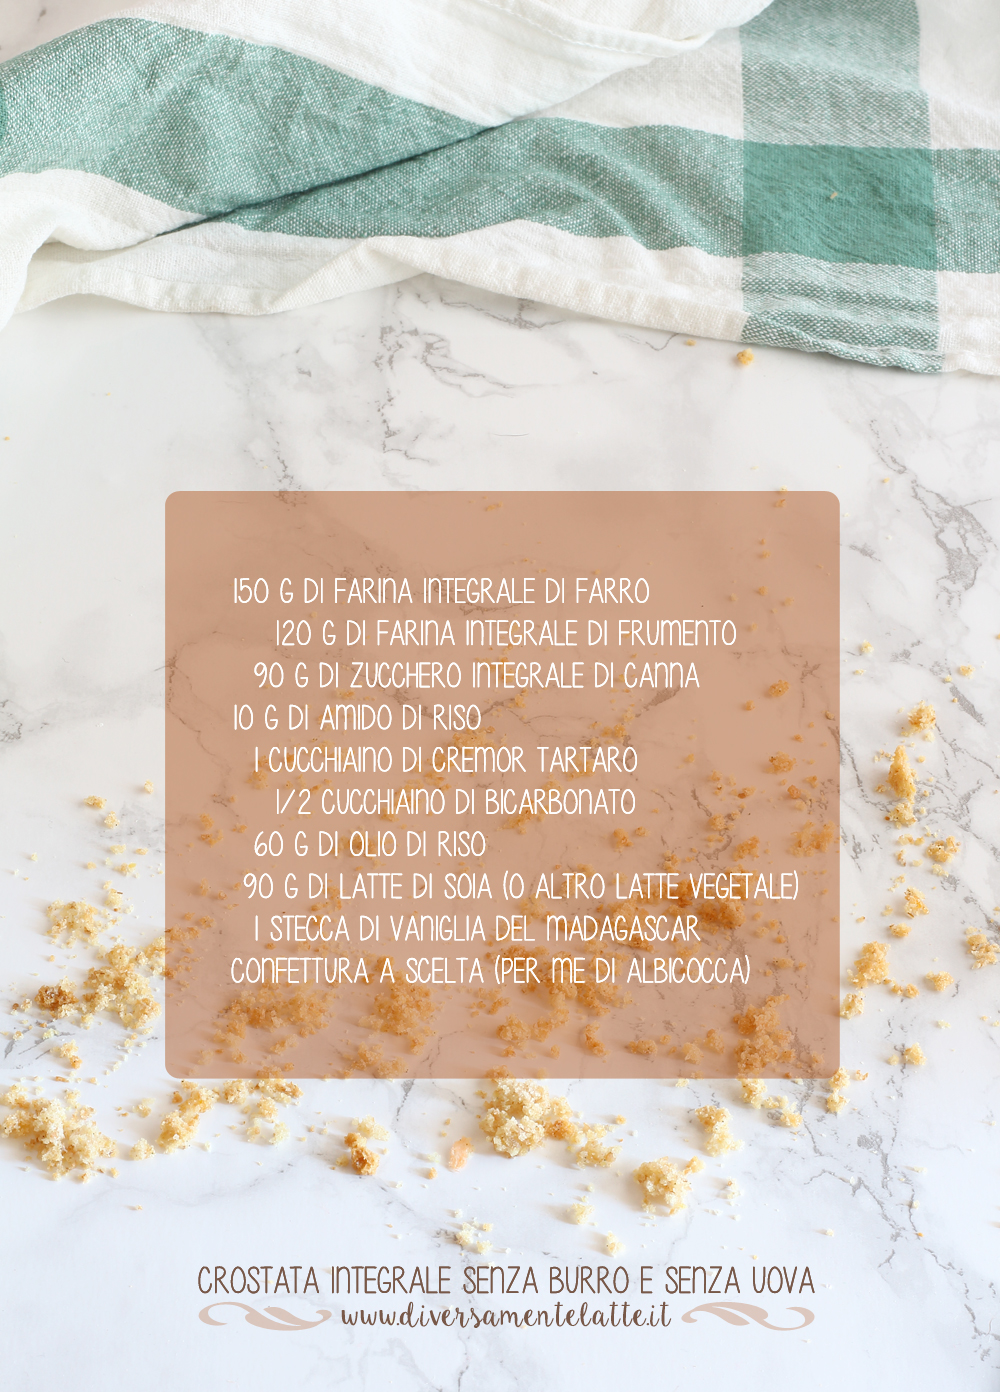 ingredienti crostata integrale senza burro e senza uova